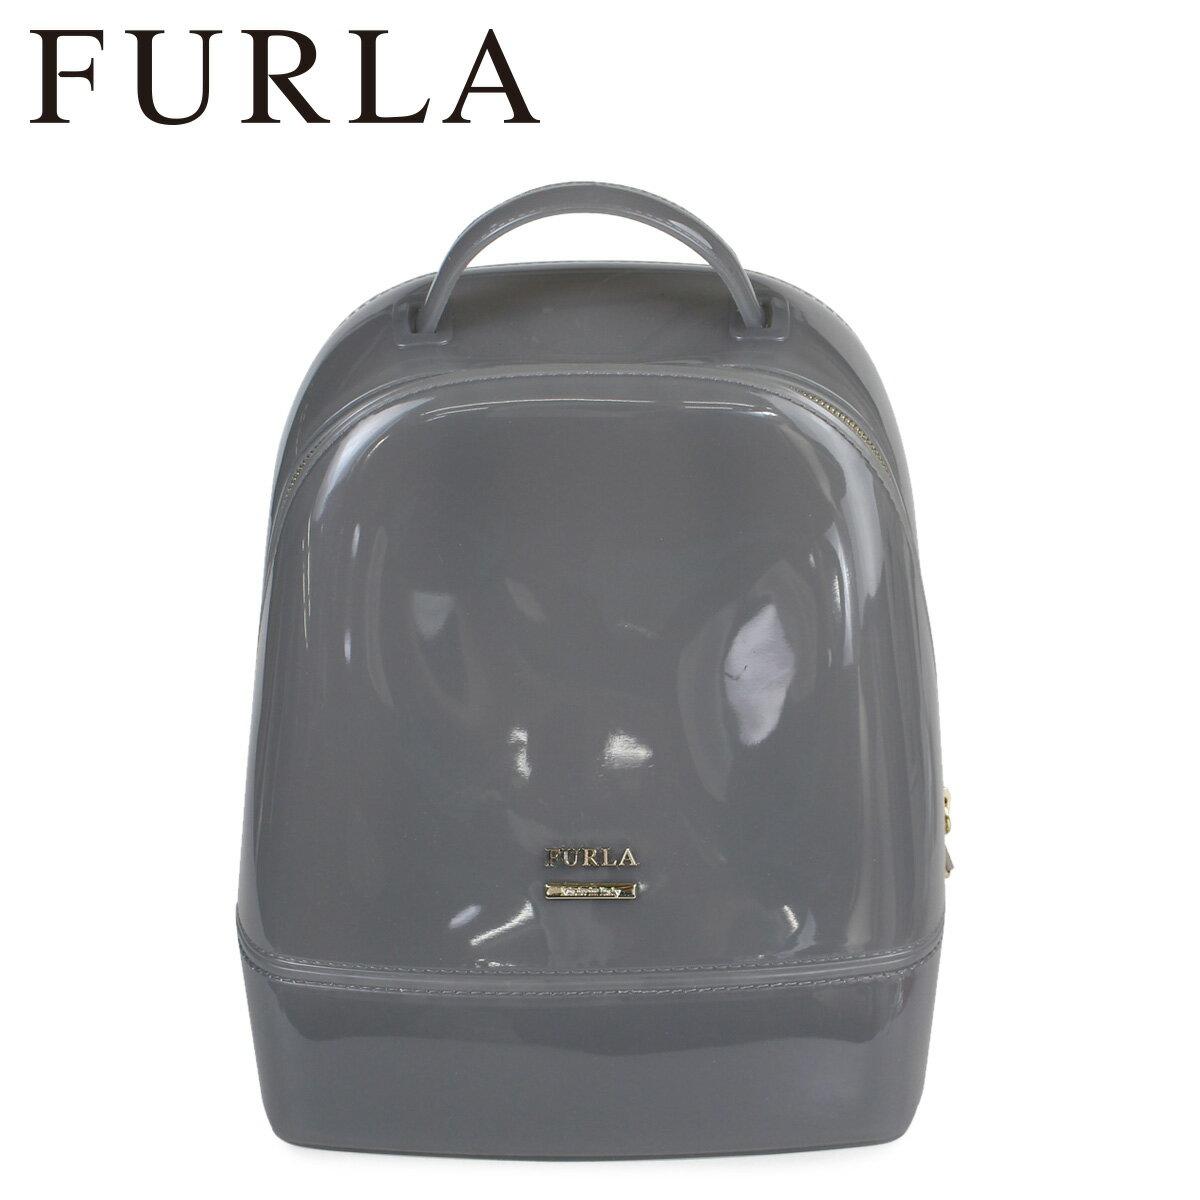 FURLA CANDY S BACK PACK RPSA フルラ バッグ リュック バックパック レディース グレー 885219 [12/26 新入荷] [1712]